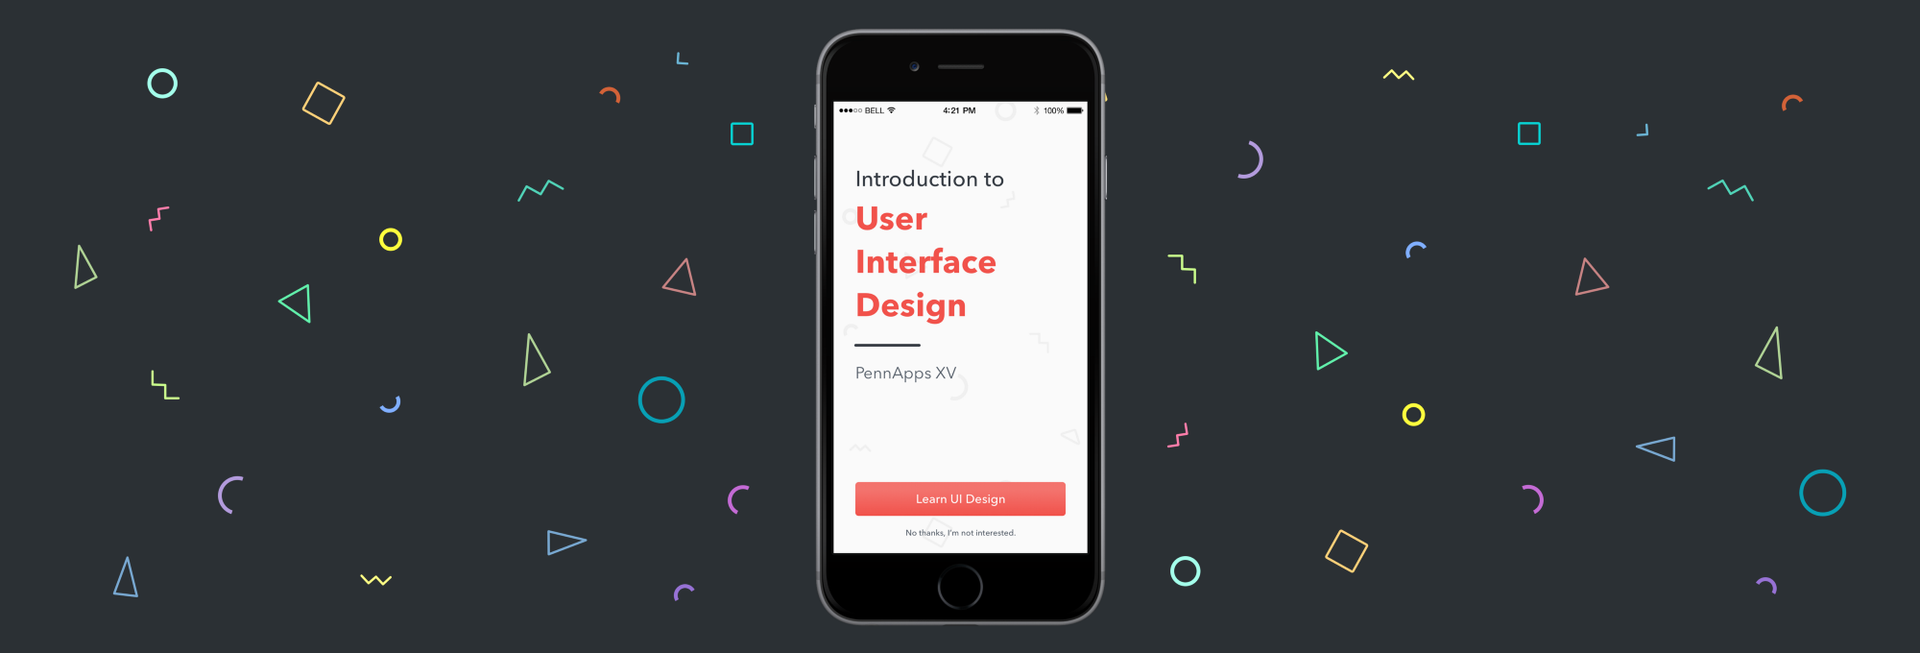 Крэш-курс по UI-дизайну - 1